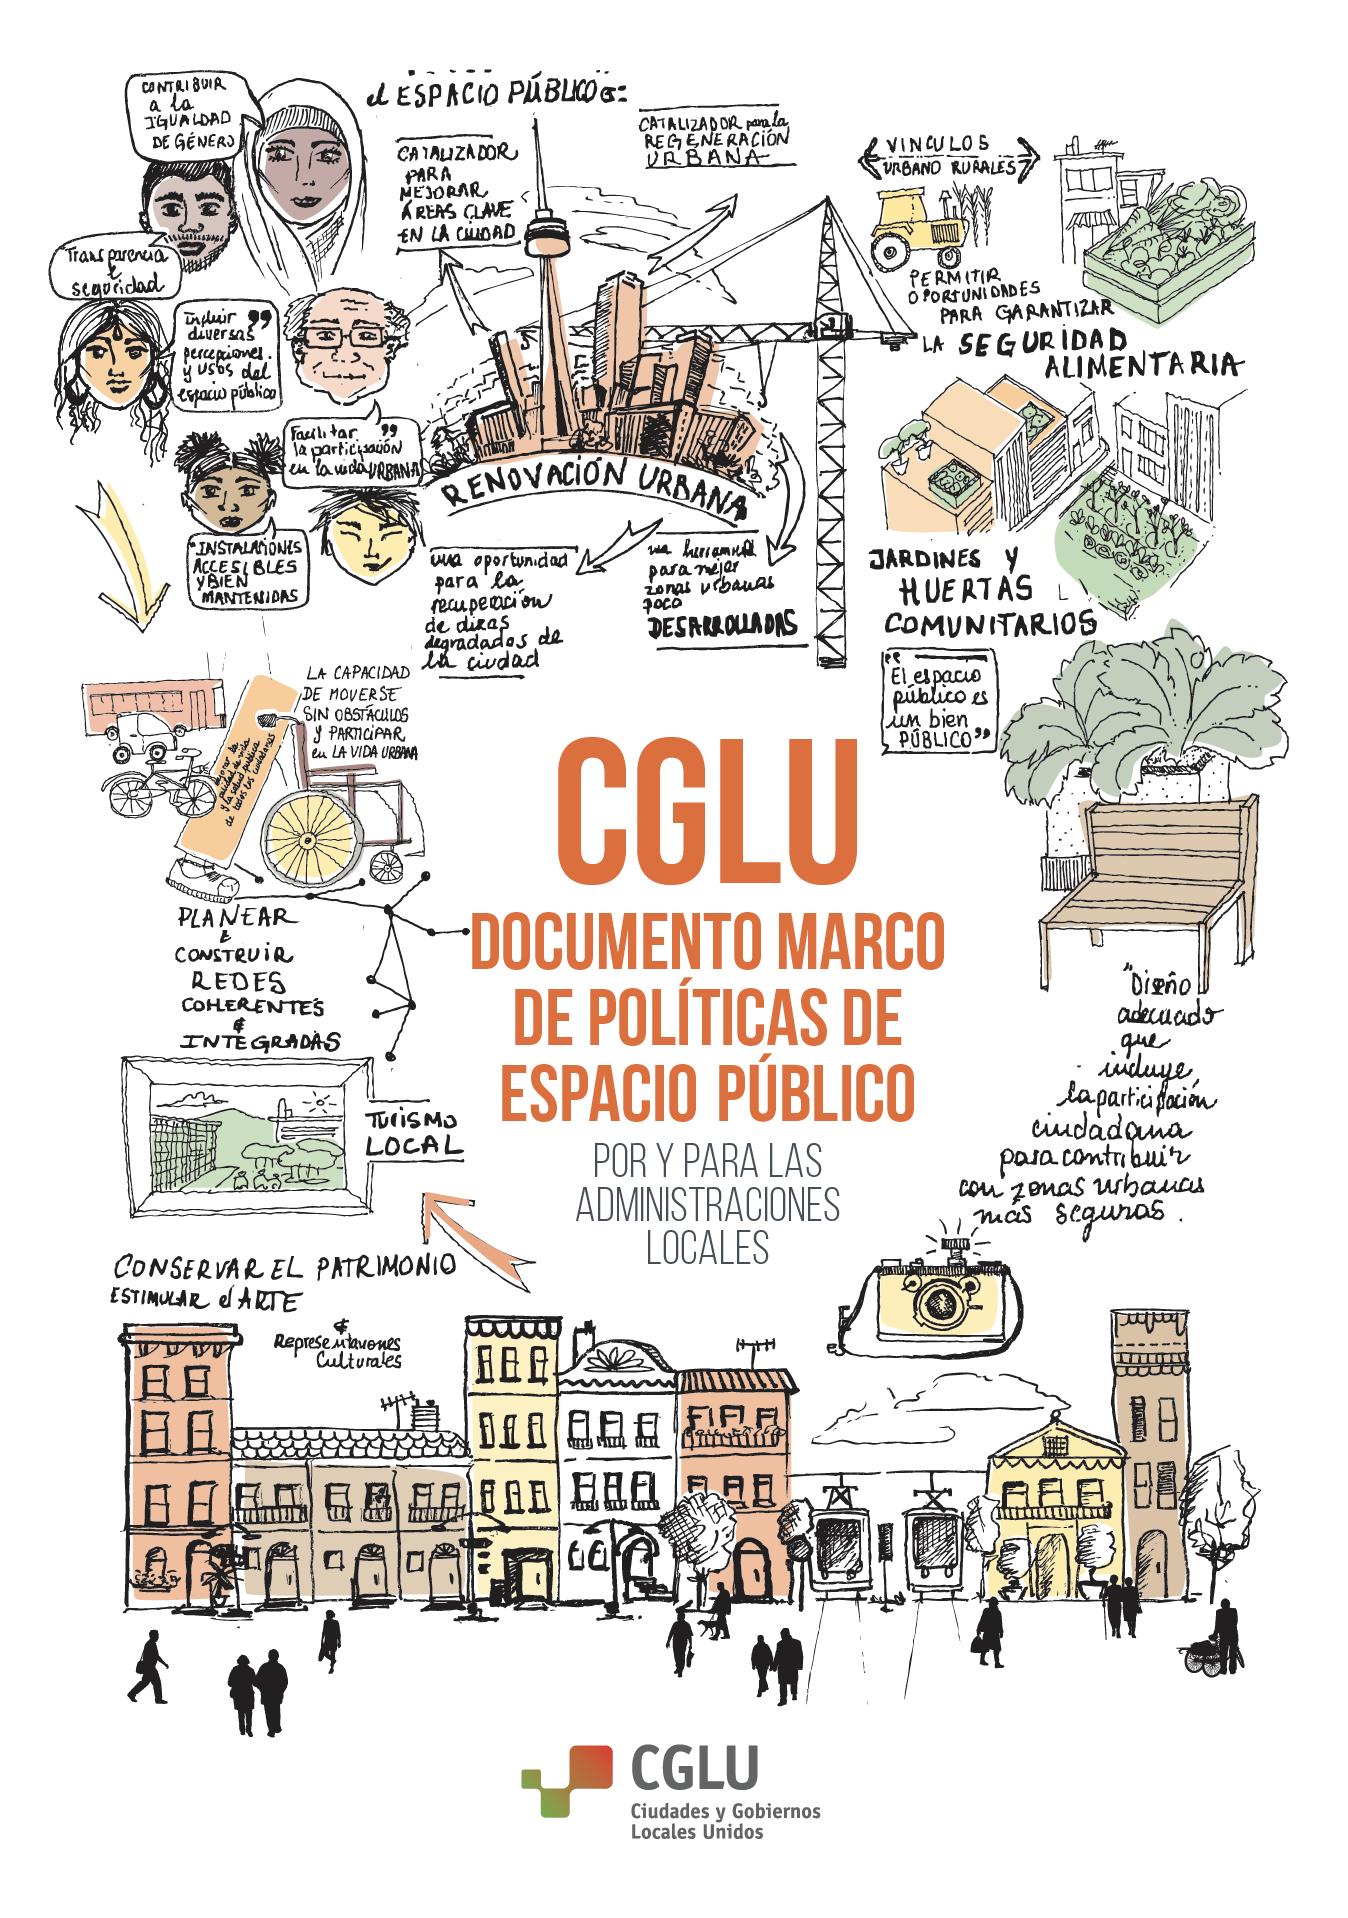 Documento marco de políticas de espacio público